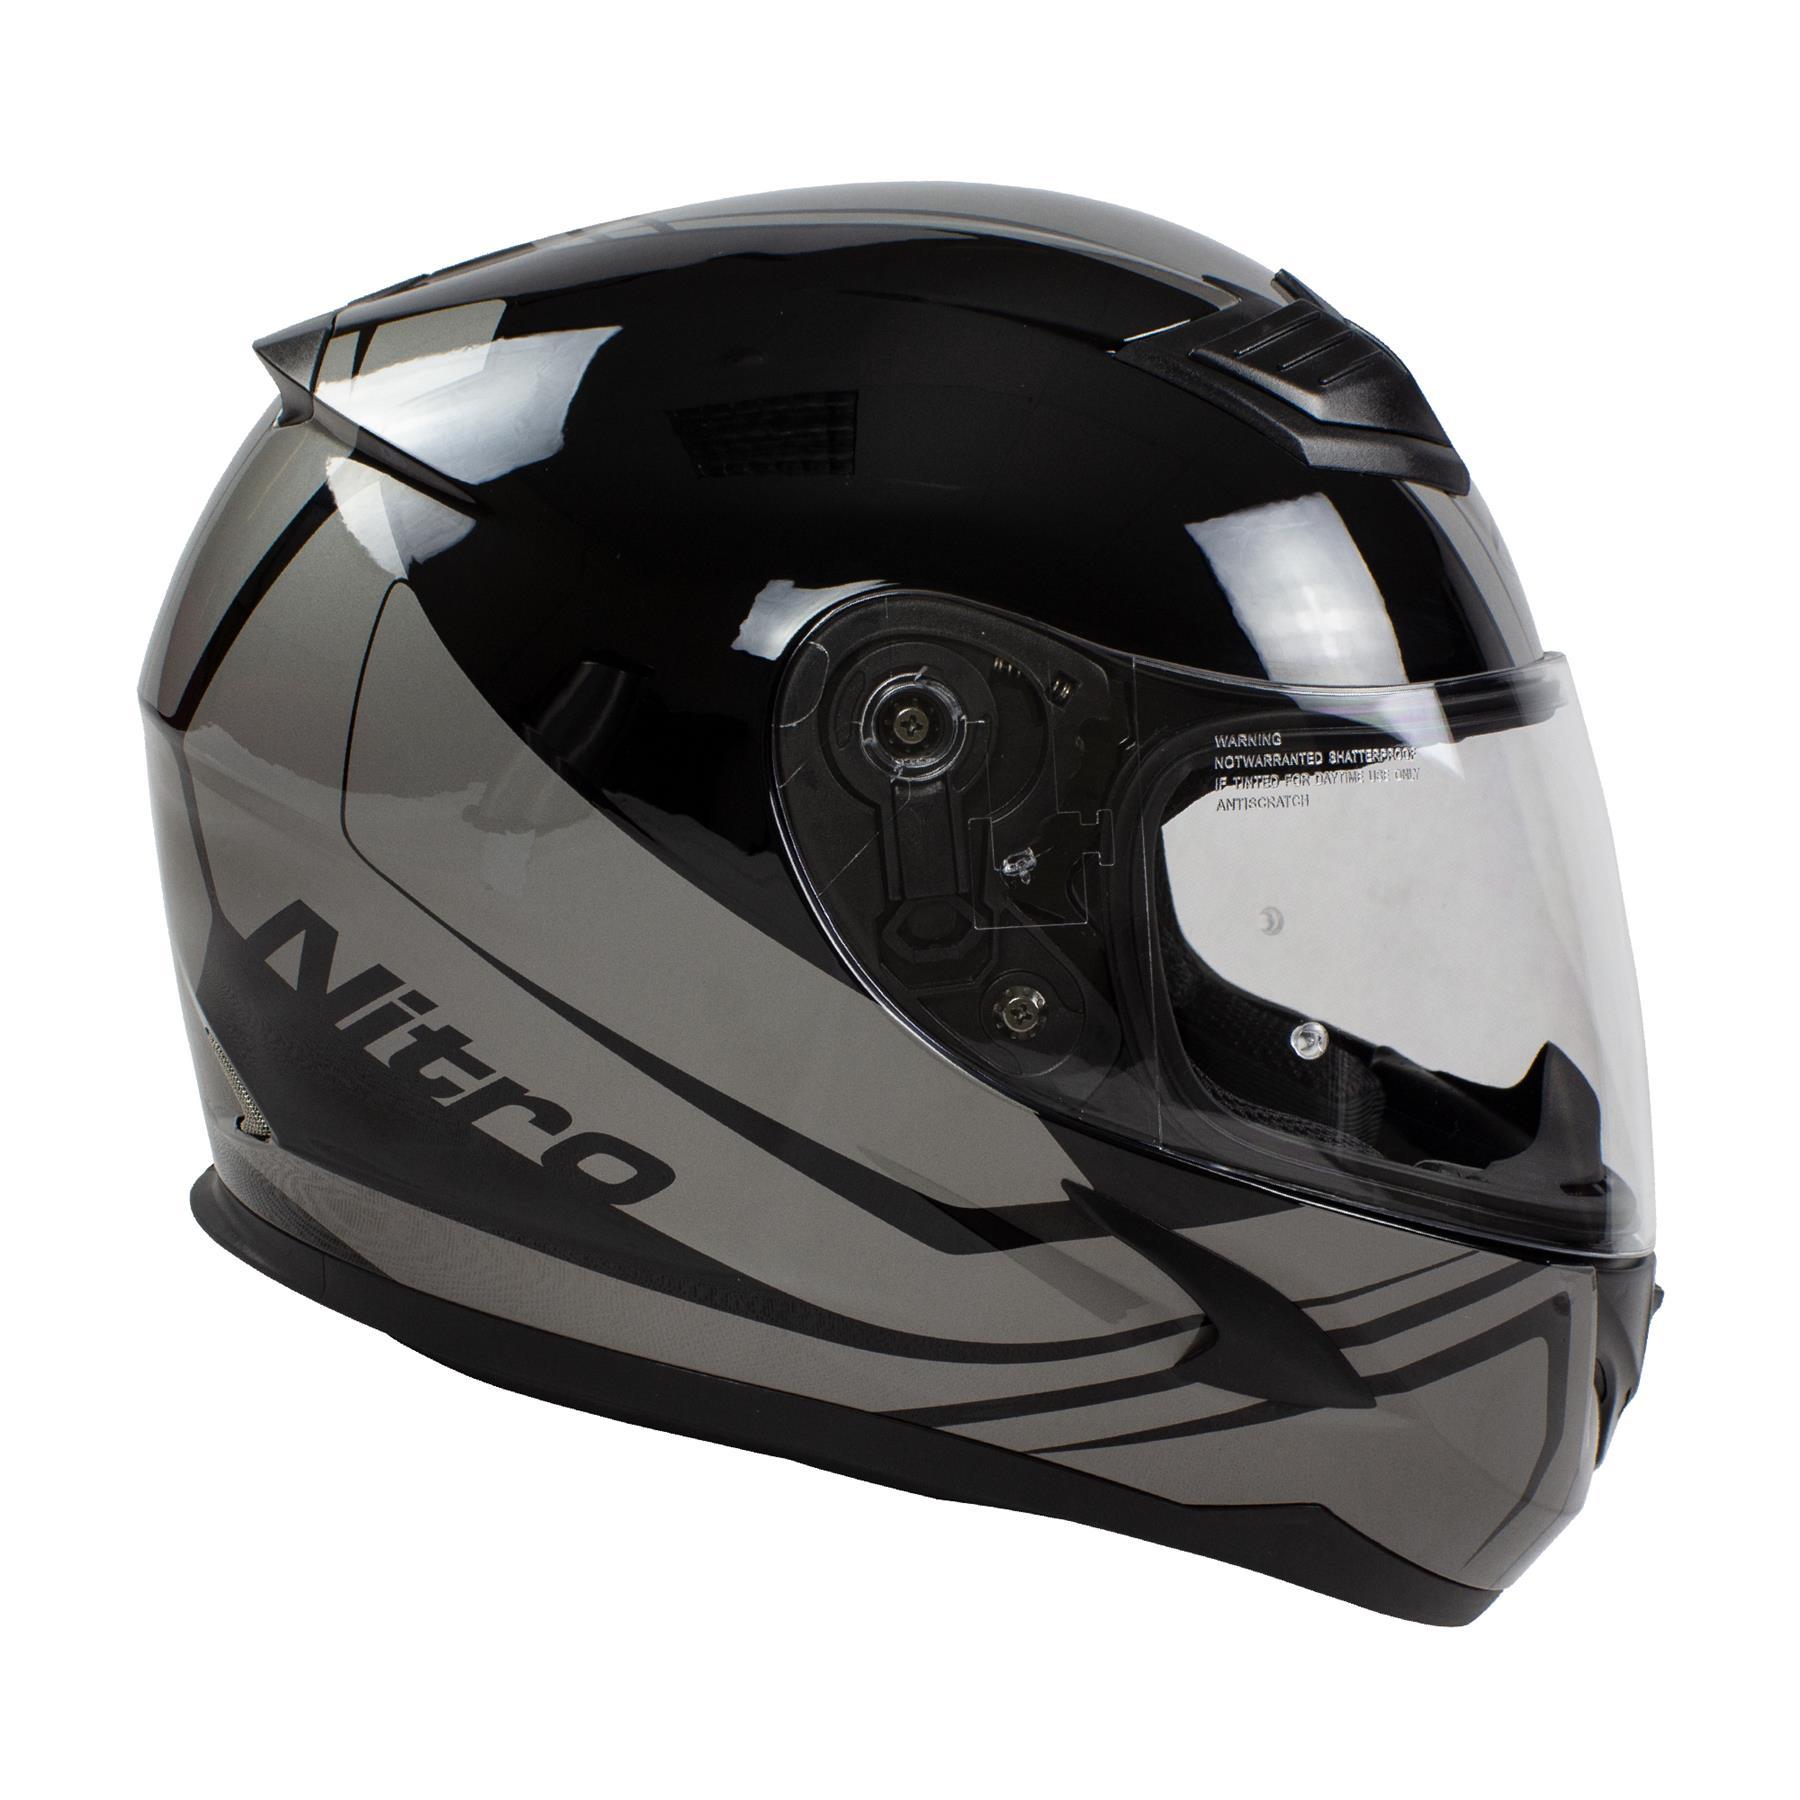 Nitro-N2400-Rogue-Full-Face-Motorcycle-Motorbike-Crash-Helmet-Black-Blue-Red thumbnail 20